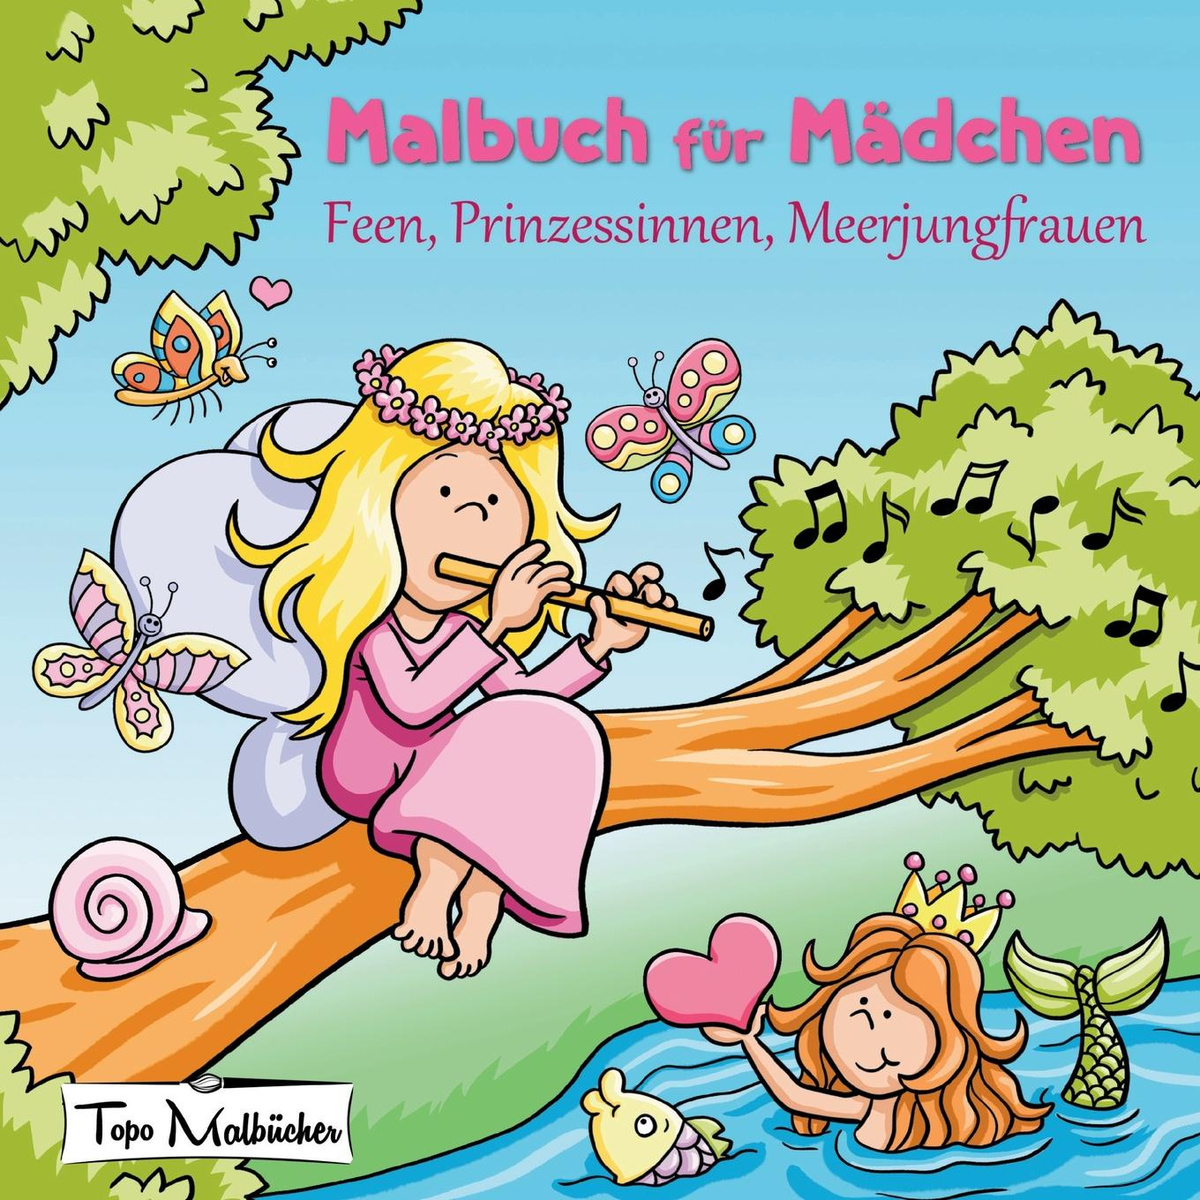 Malbuch Fur Madchen Feen Prinzessinnen Meerjungfrauen